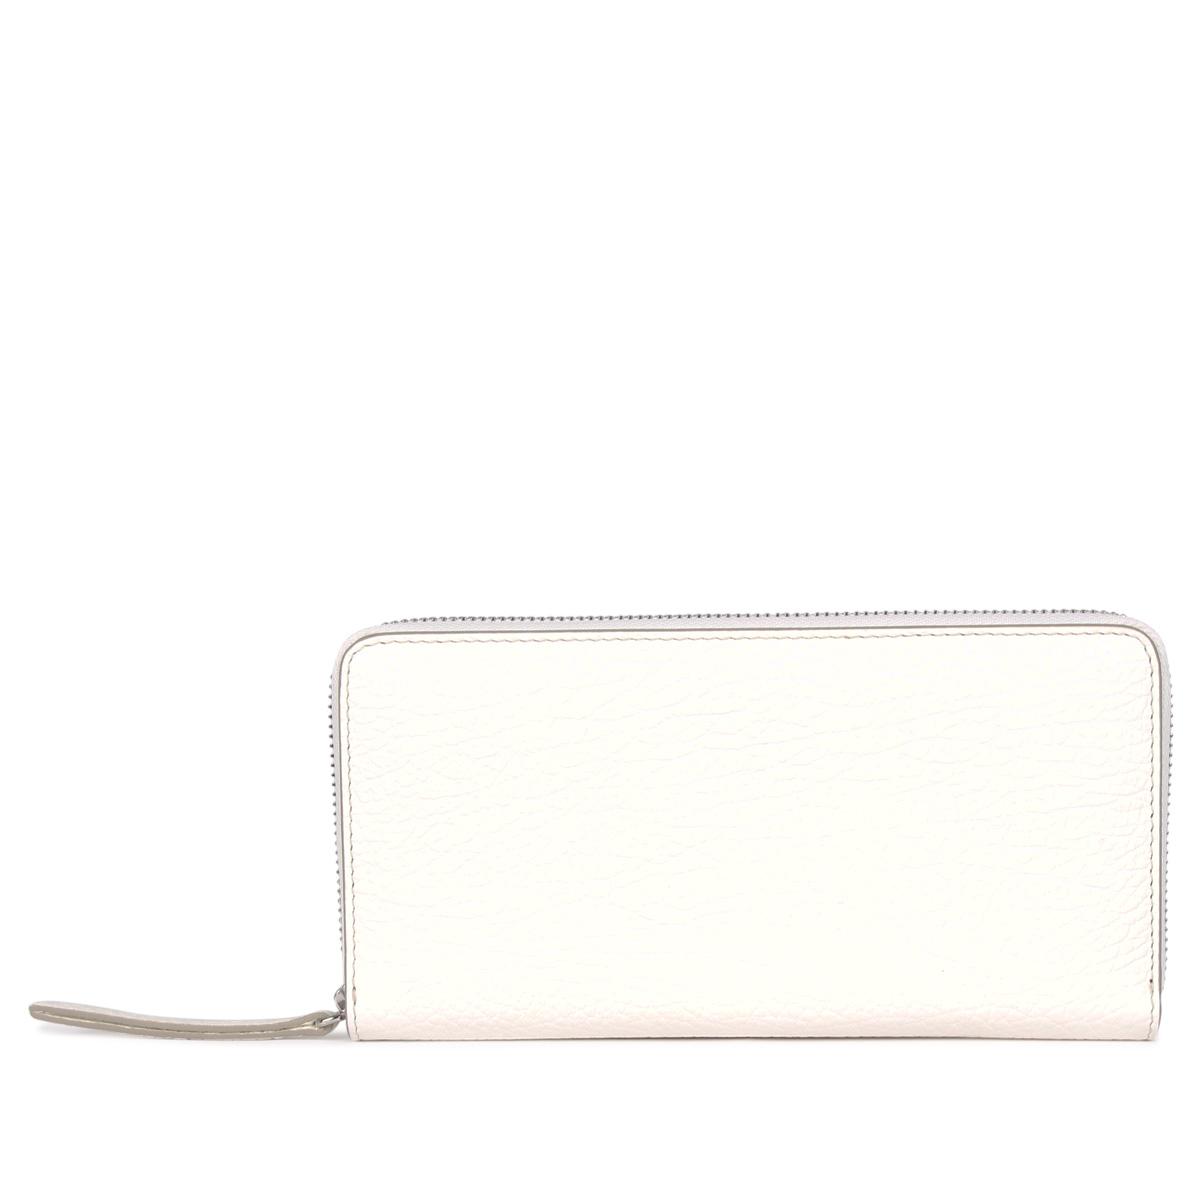 MAISON MARGIELA LONG WALLET メゾンマルジェラ 財布 長財布 メンズ レディース ラウンドファスナー ホワイト 白 S56UI0110